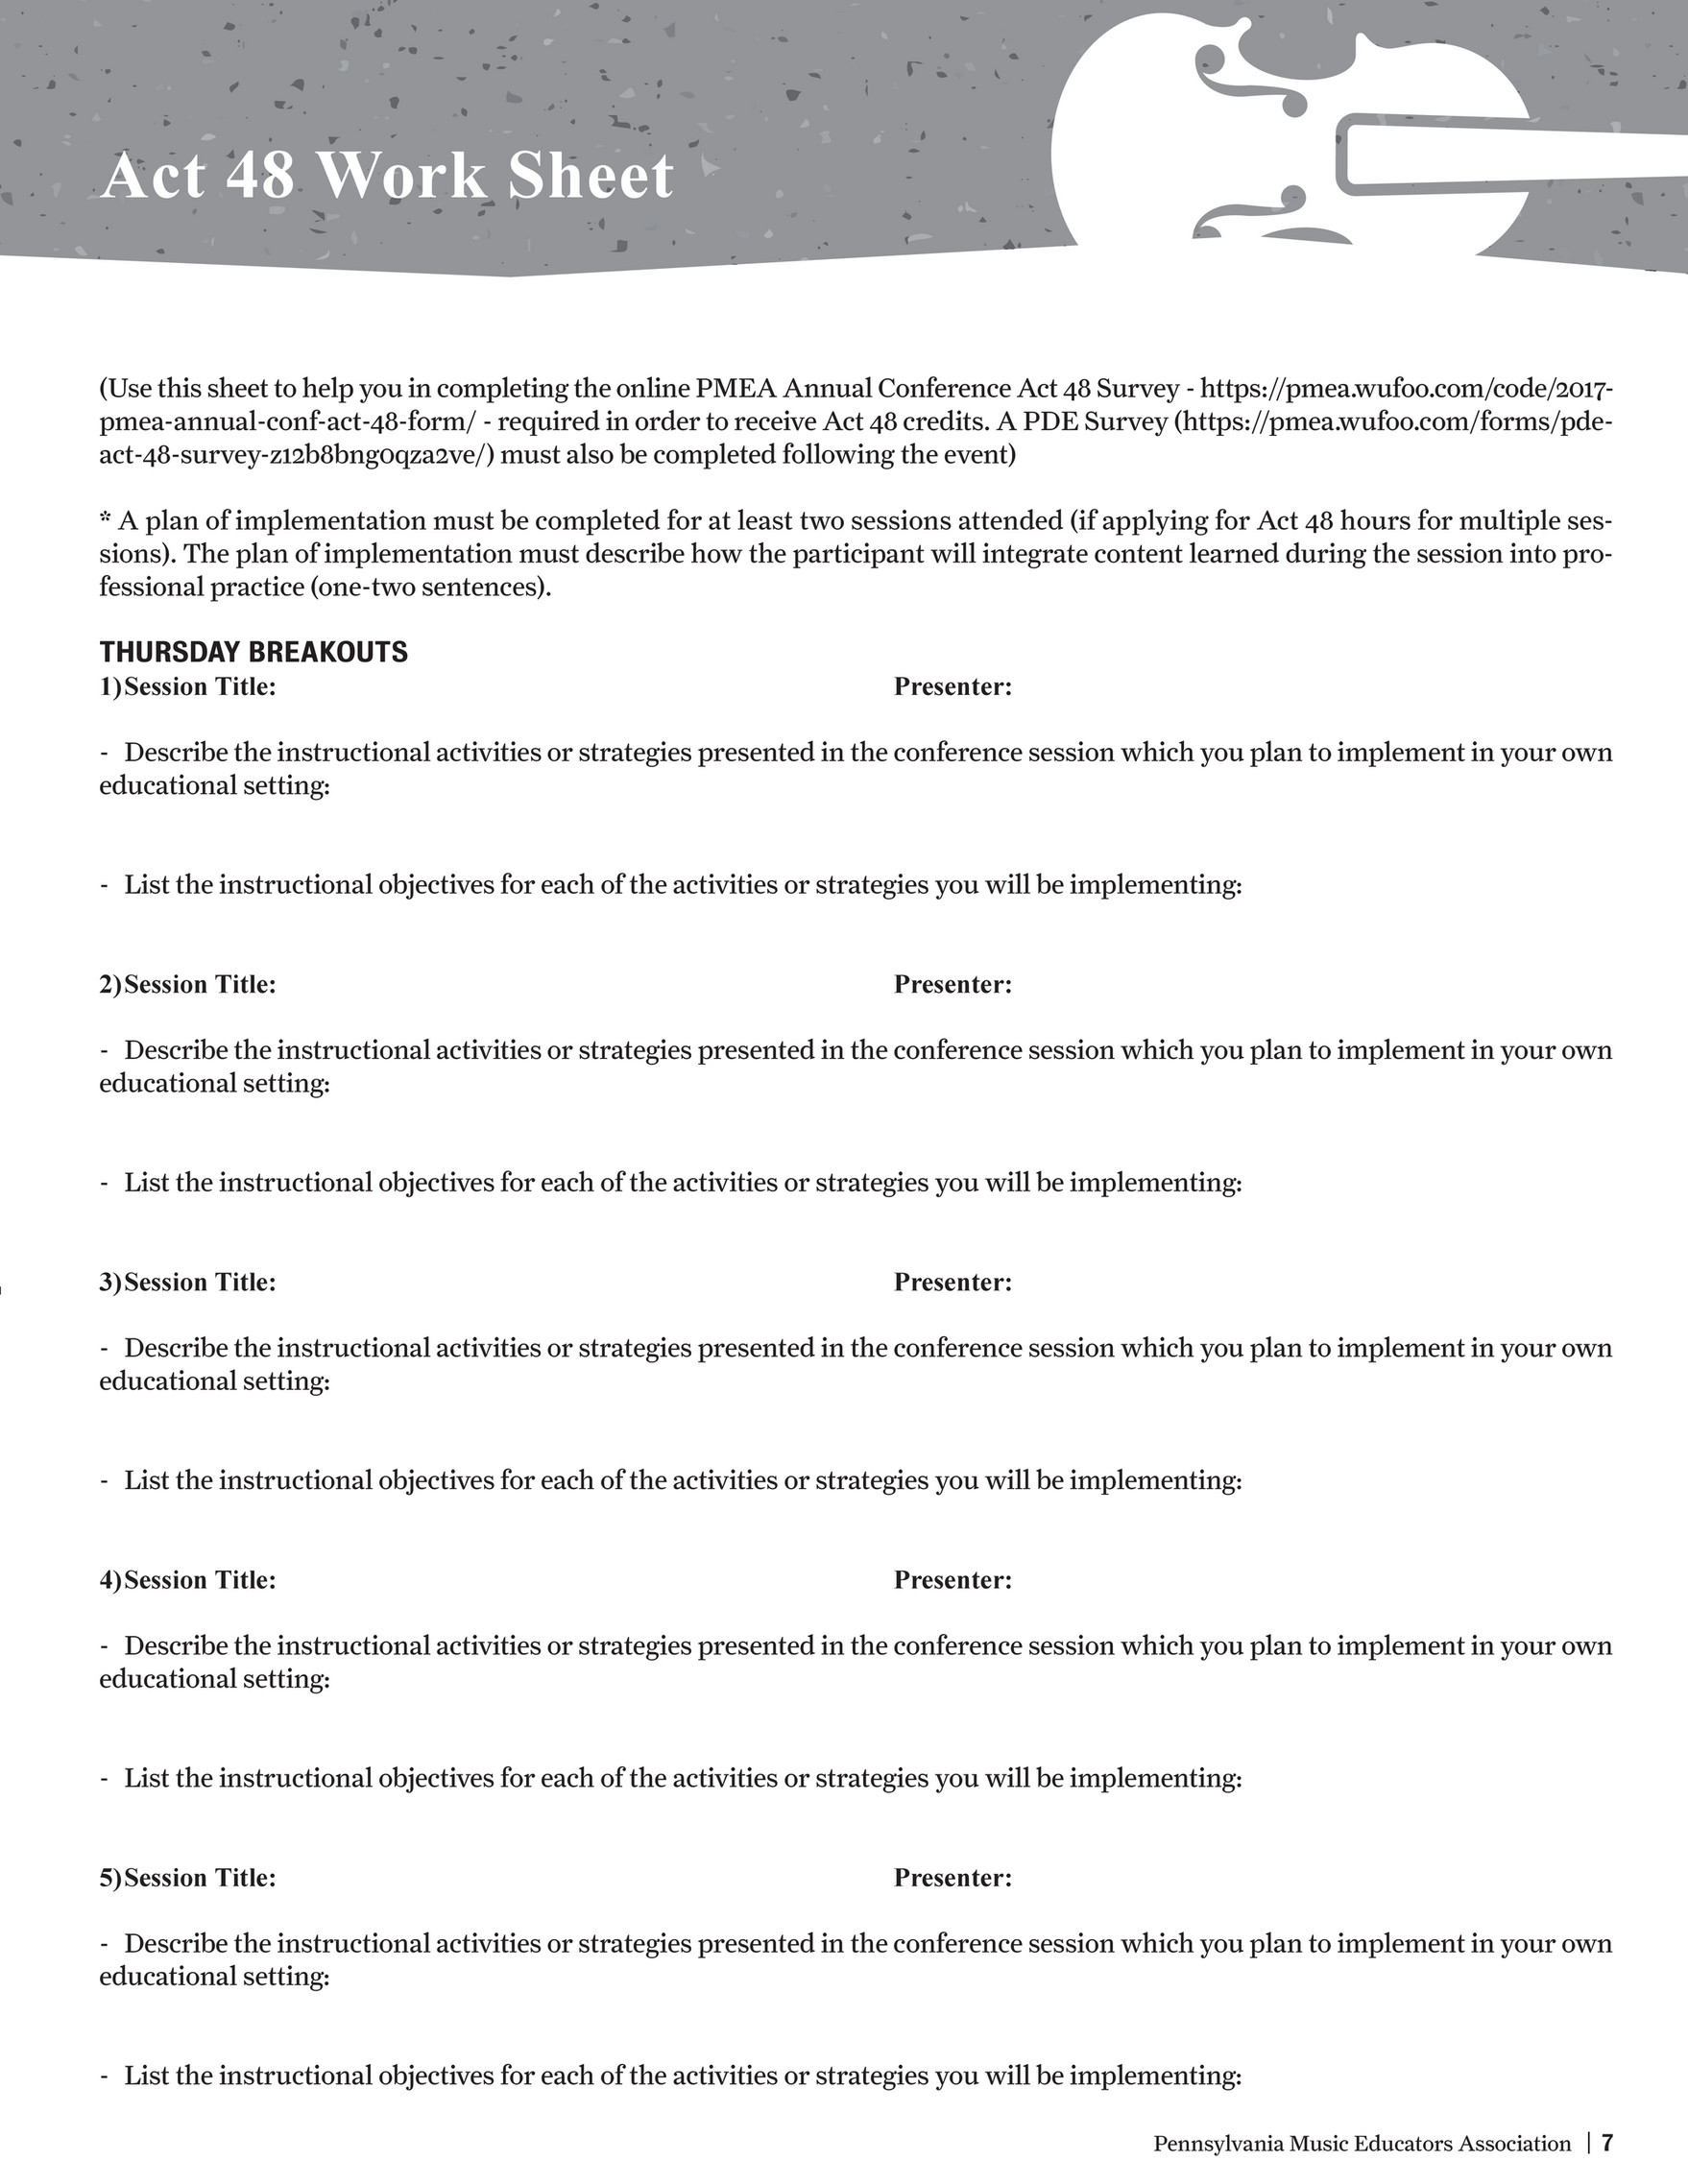 PMEA - 2017 PMEA In-service Conference Program - Page 8-9 - Created with  Publitas.com